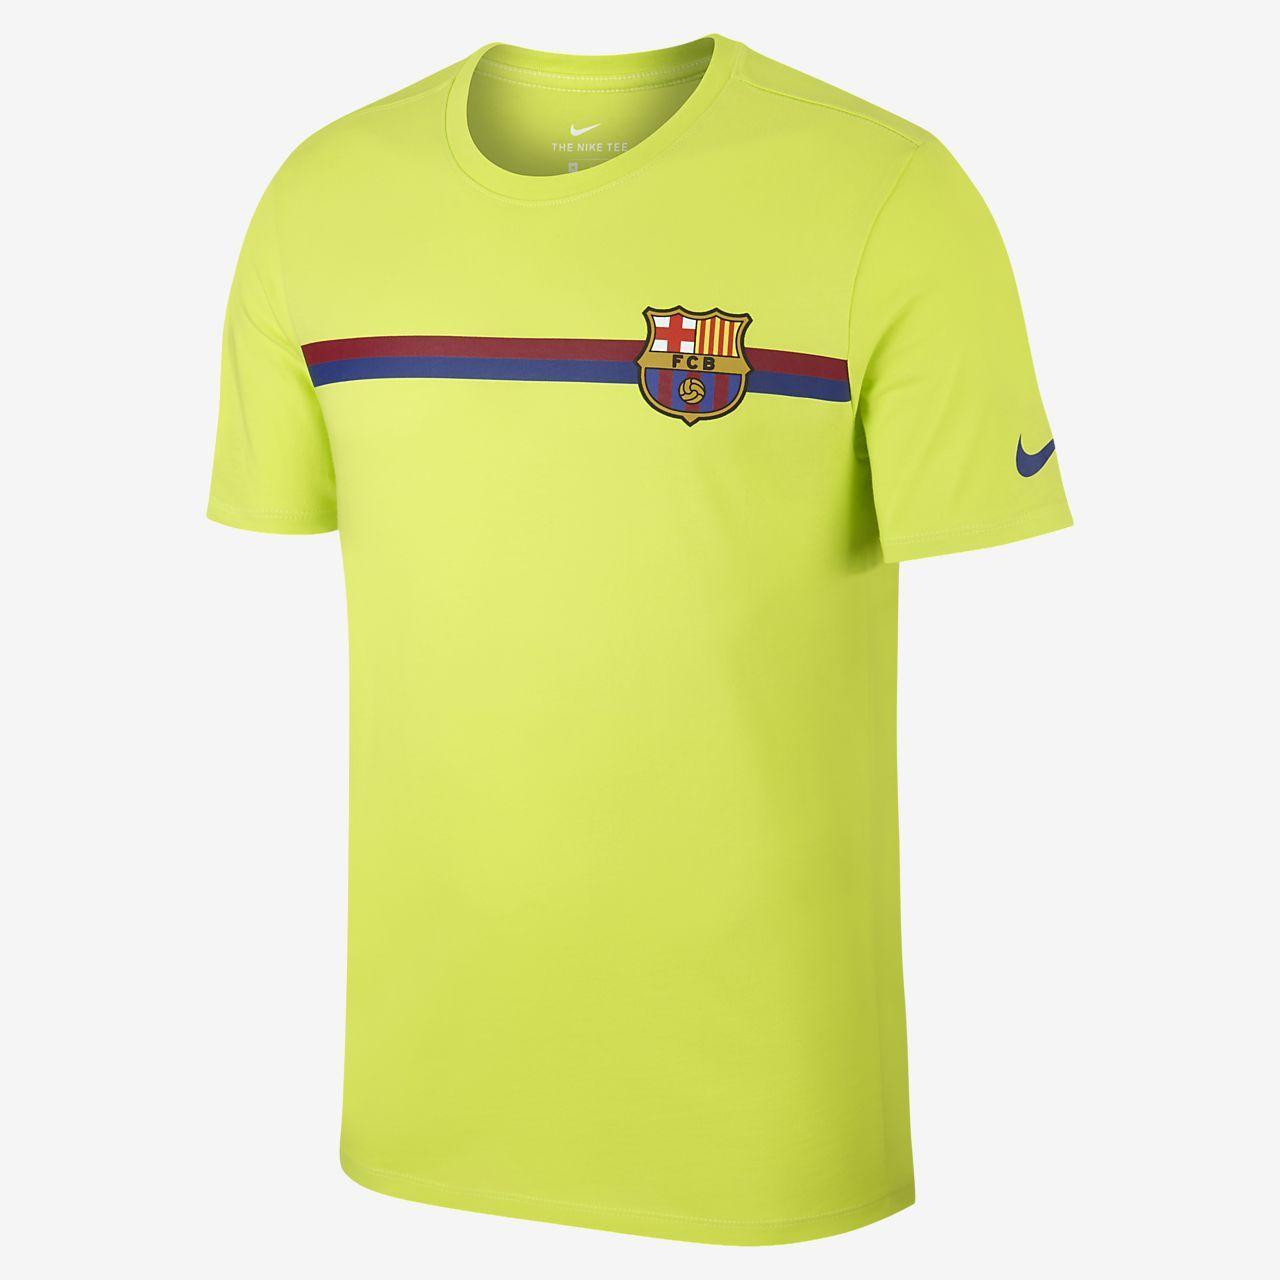 Fc Barcelona T Crest HerenNl Shirt 8kwO0nP